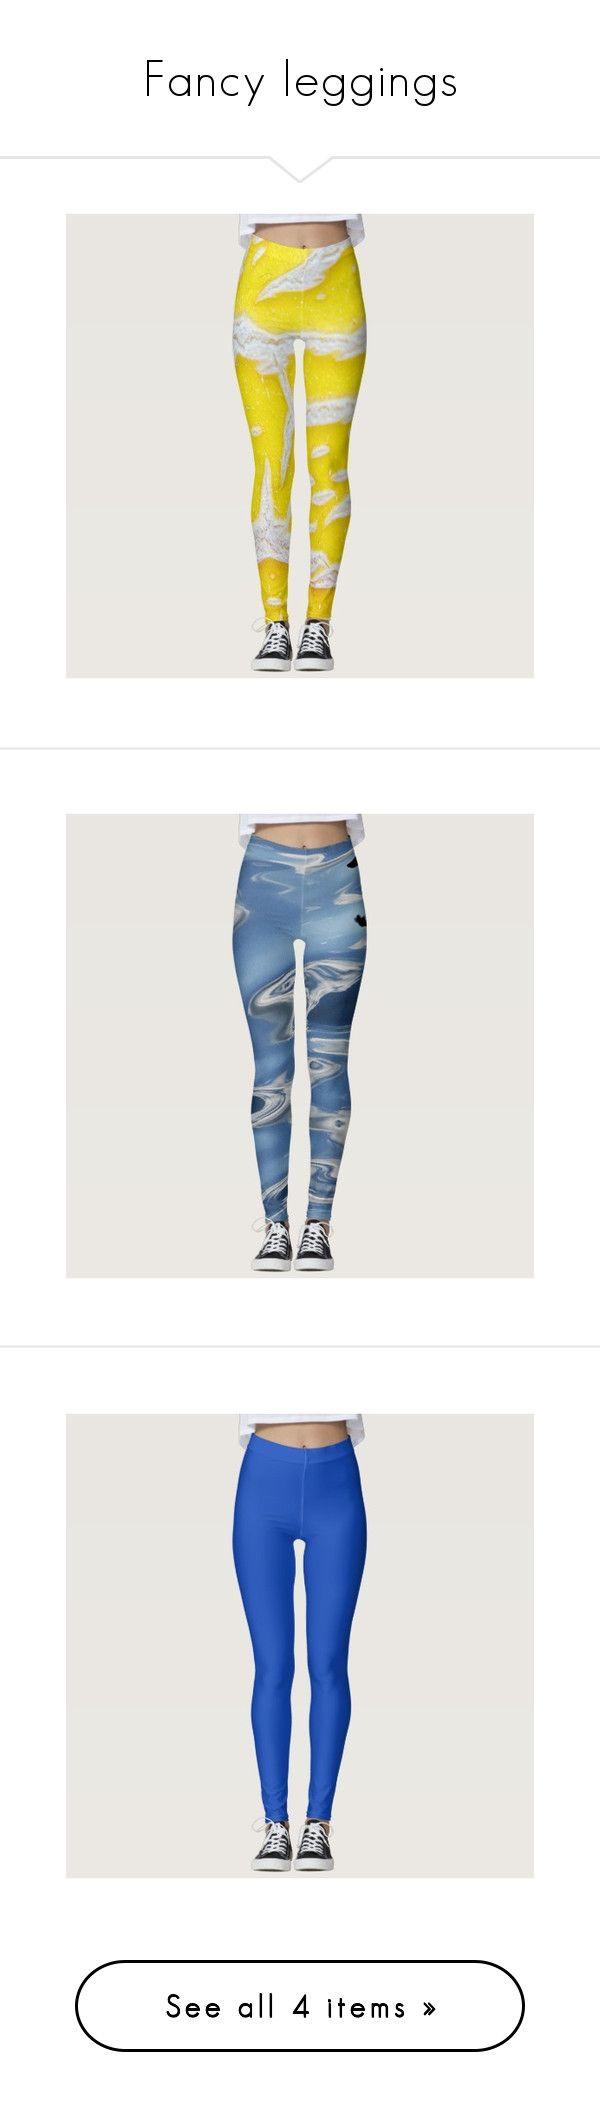 """Fancy leggings"" by karinravasio ❤ liked on Polyvore featuring pants, leggings, patterned leggings, yellow pants, patterned pants, legging pants, yellow leggings, blue trousers, blue leggings and abstract leggings"